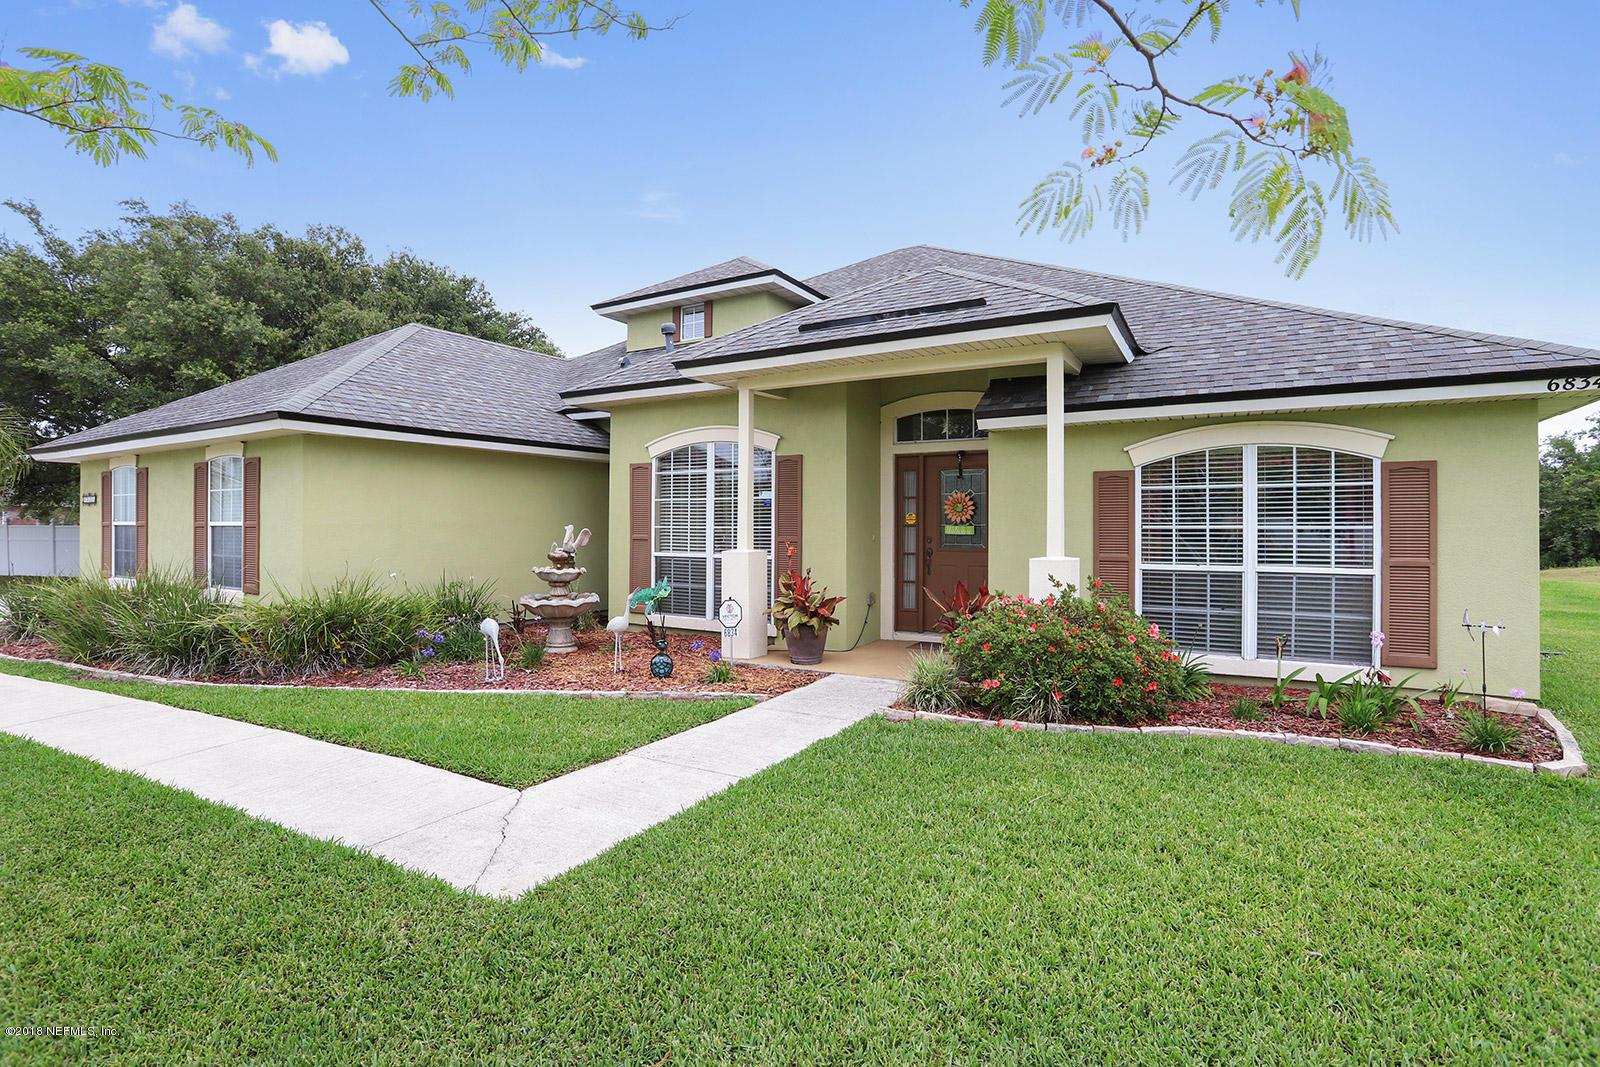 6834 ELKMONT, JACKSONVILLE, FLORIDA 32226, 4 Bedrooms Bedrooms, ,3 BathroomsBathrooms,Residential - single family,For sale,ELKMONT,936908